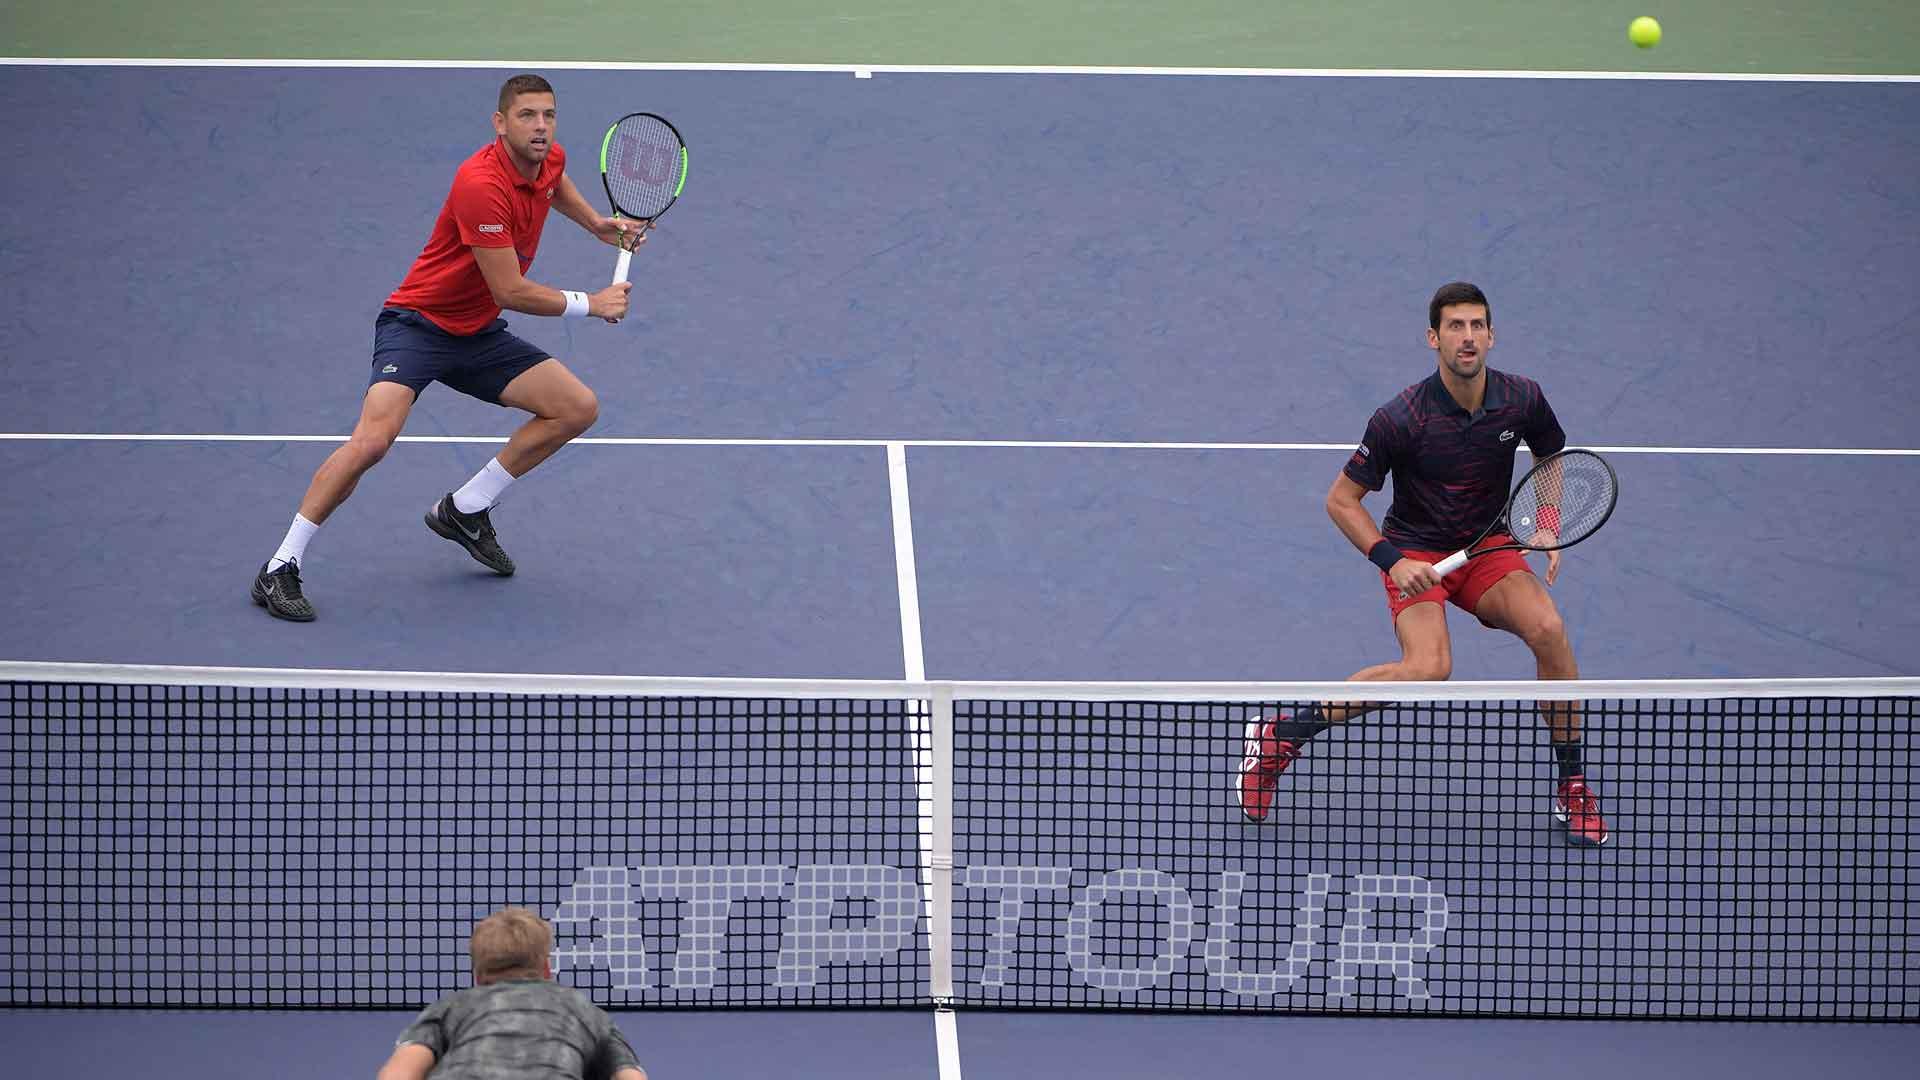 Krajinovic Djokovic Stop Nitto Atp Finals Hopes In Shanghai Atp Tour Tennis